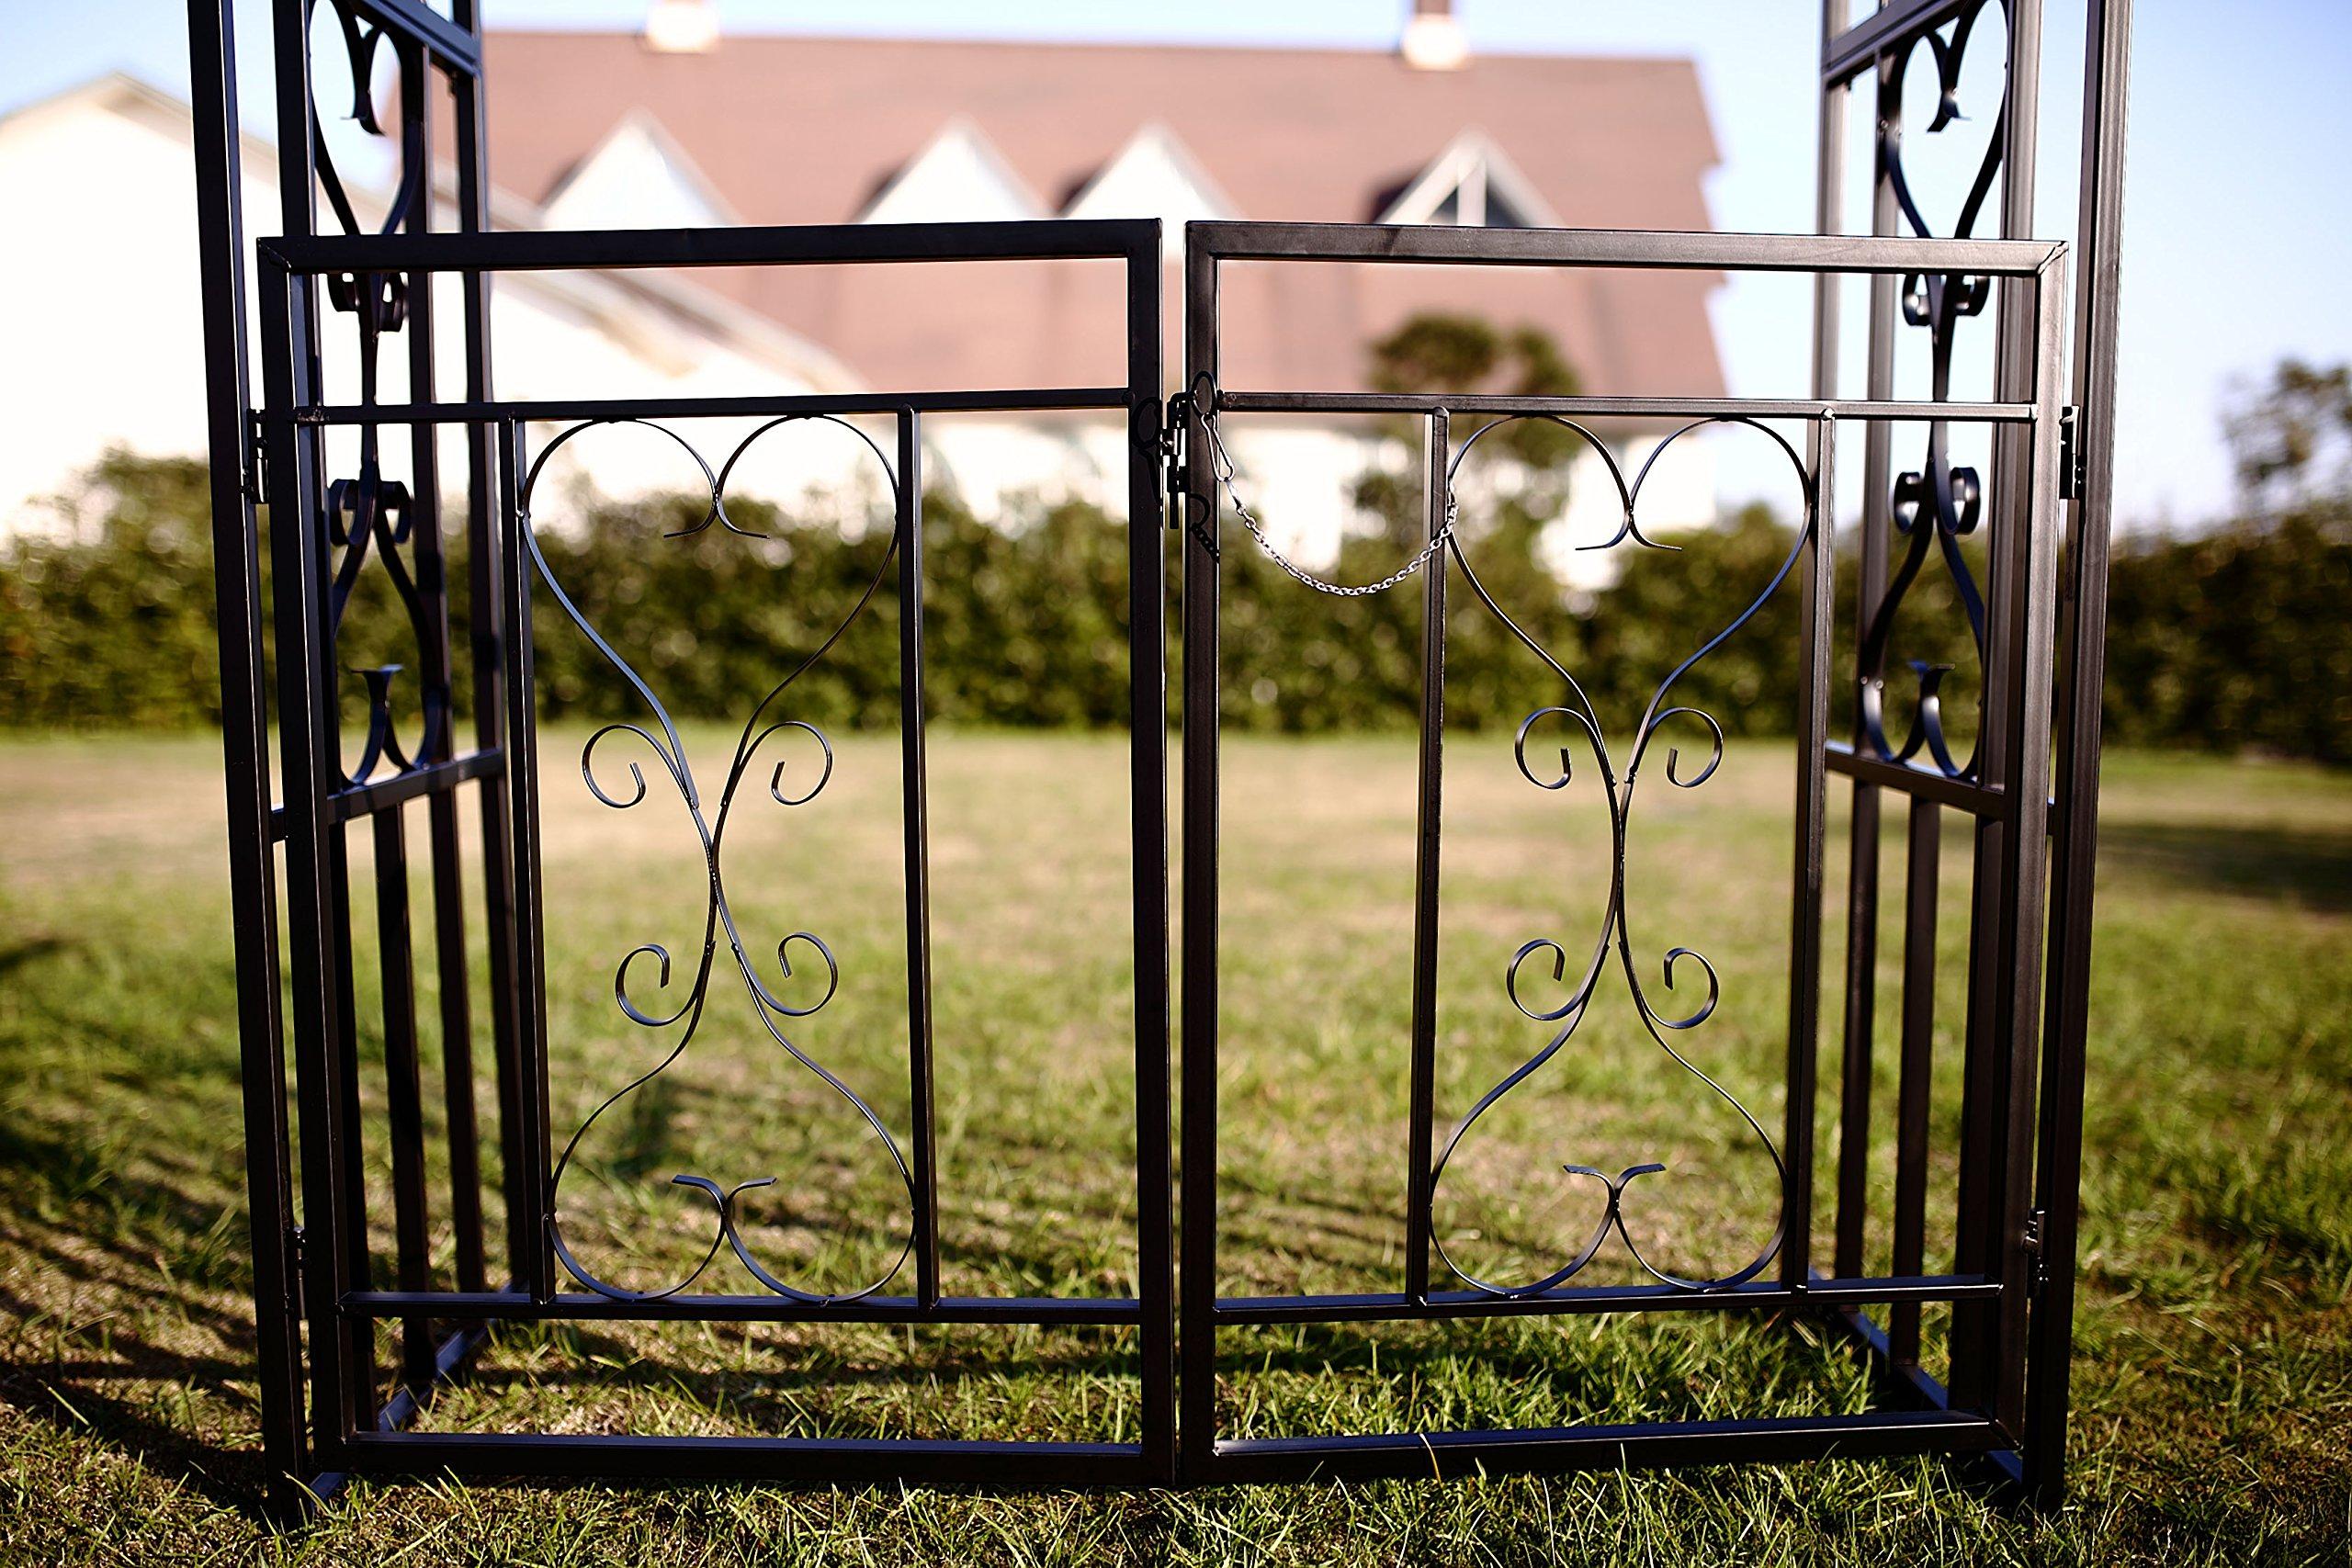 1. GO Steel Garden Arch with Gate, 6'7'' High x 3'7'' Wide, Garden Arbor for Various Climbing Plant, Outdoor Garden Lawn Backyard by 1. GO (Image #7)